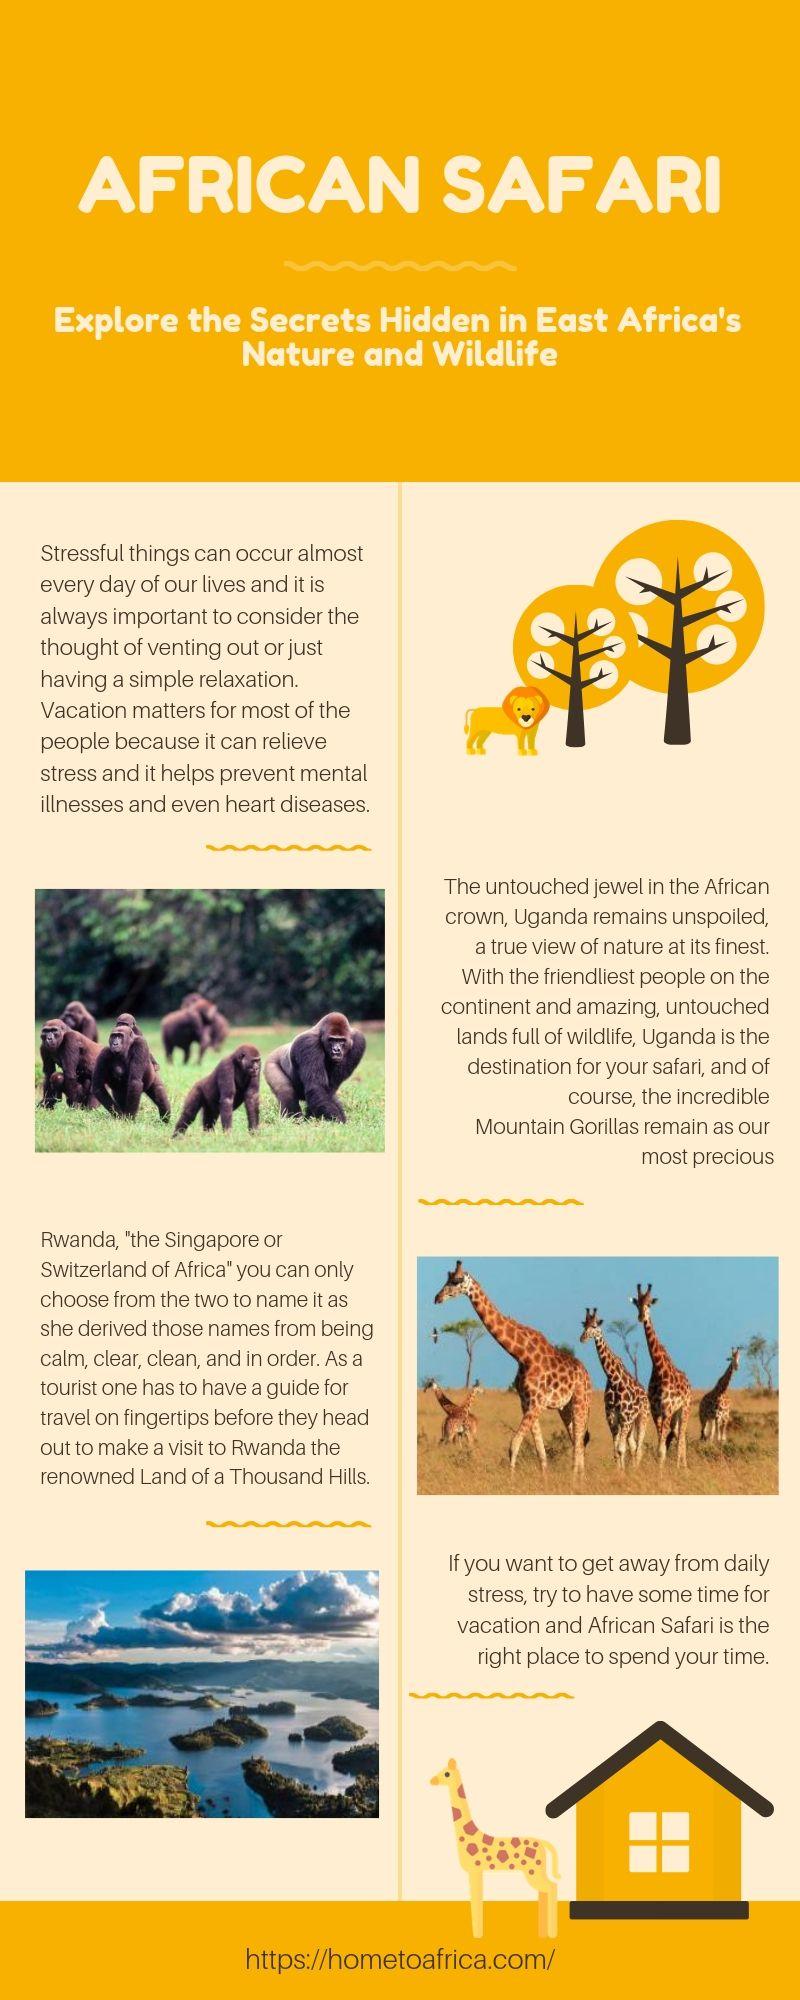 About   African Safari   African safari, Safari, Travel companies